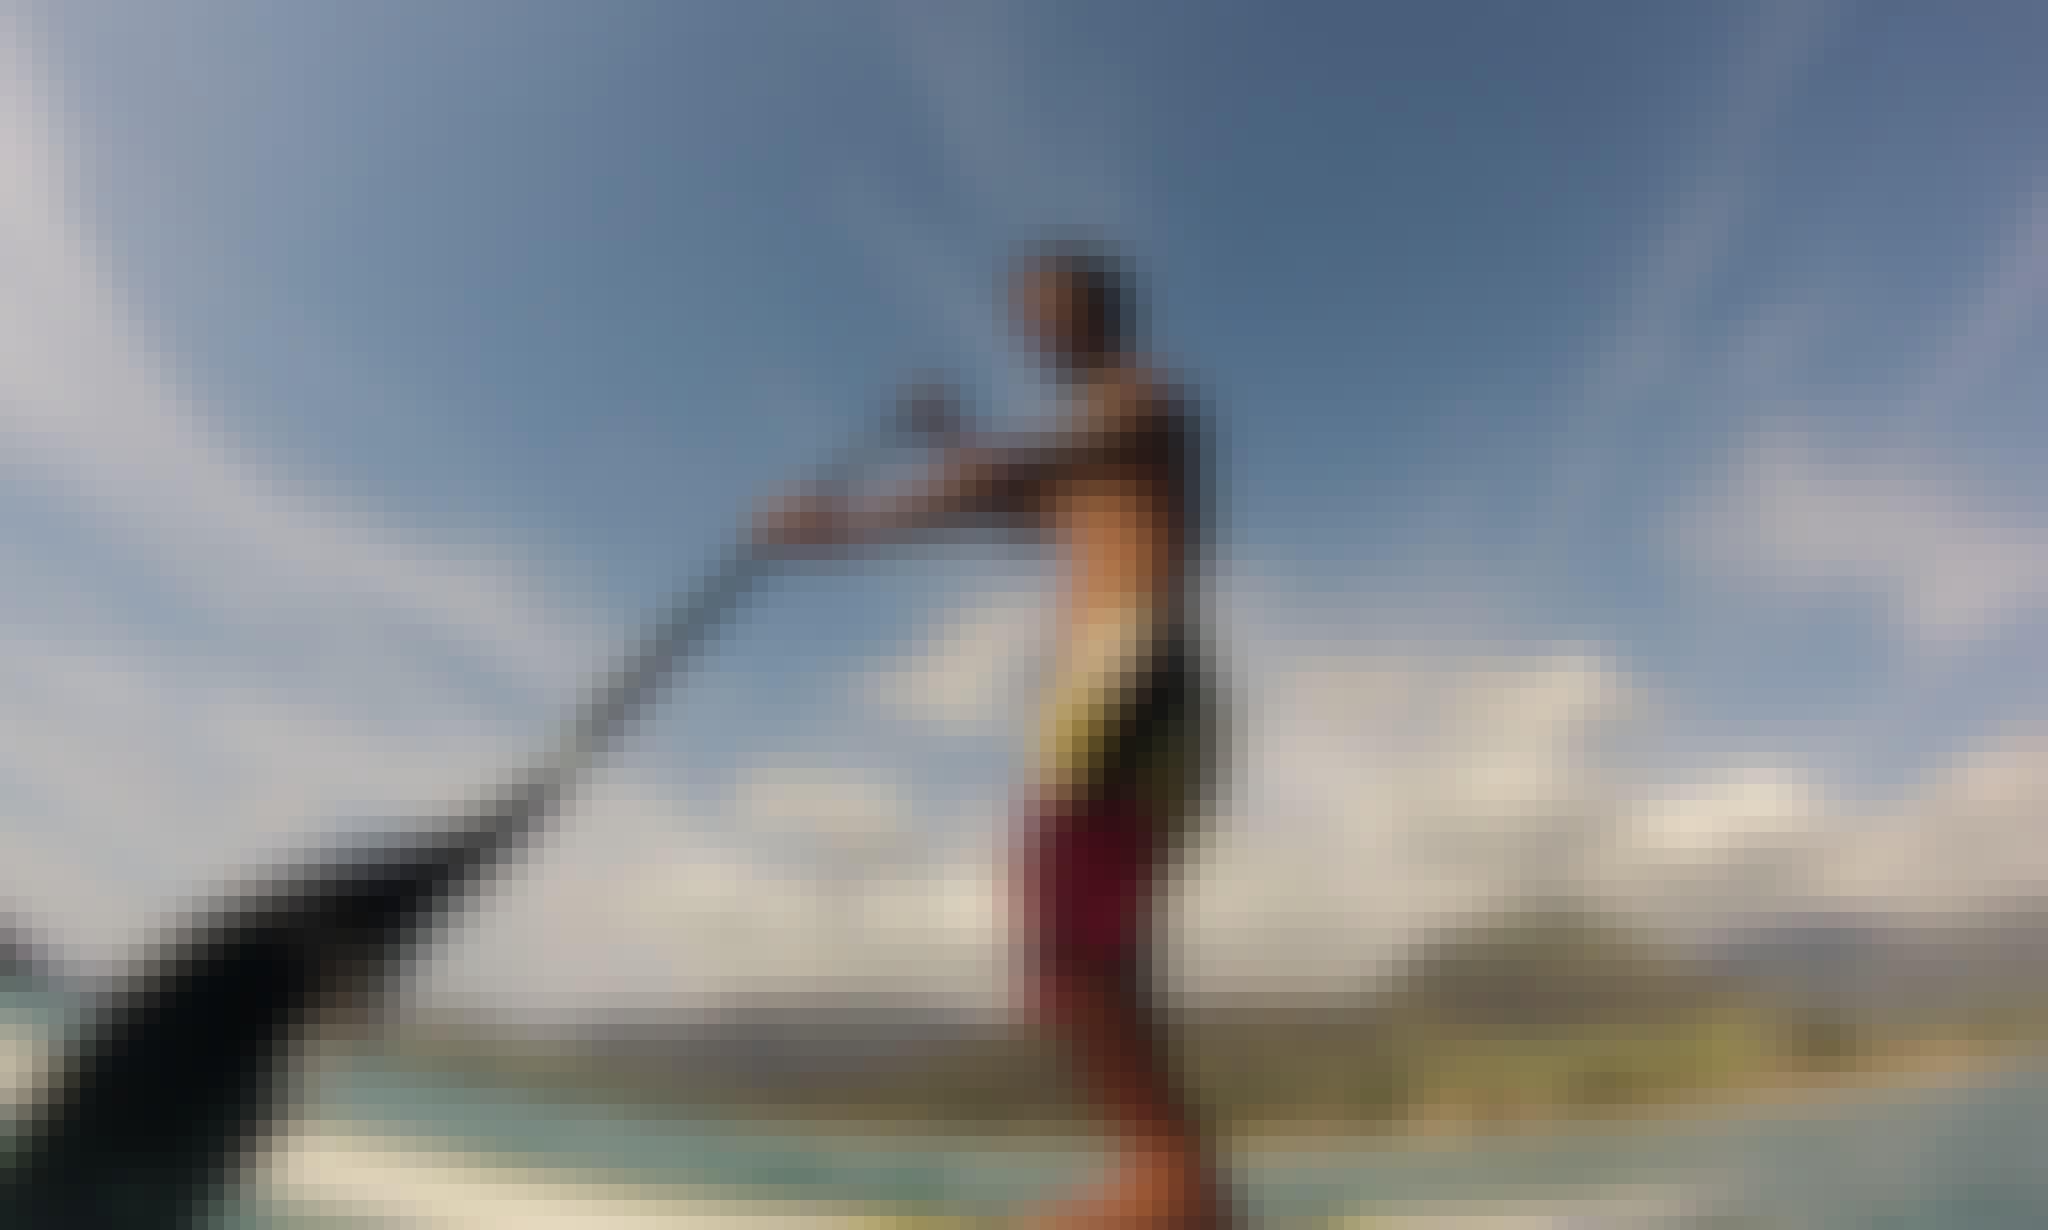 Full-day Stand-up Paddleboard Rental in Honolulu, Hawaii